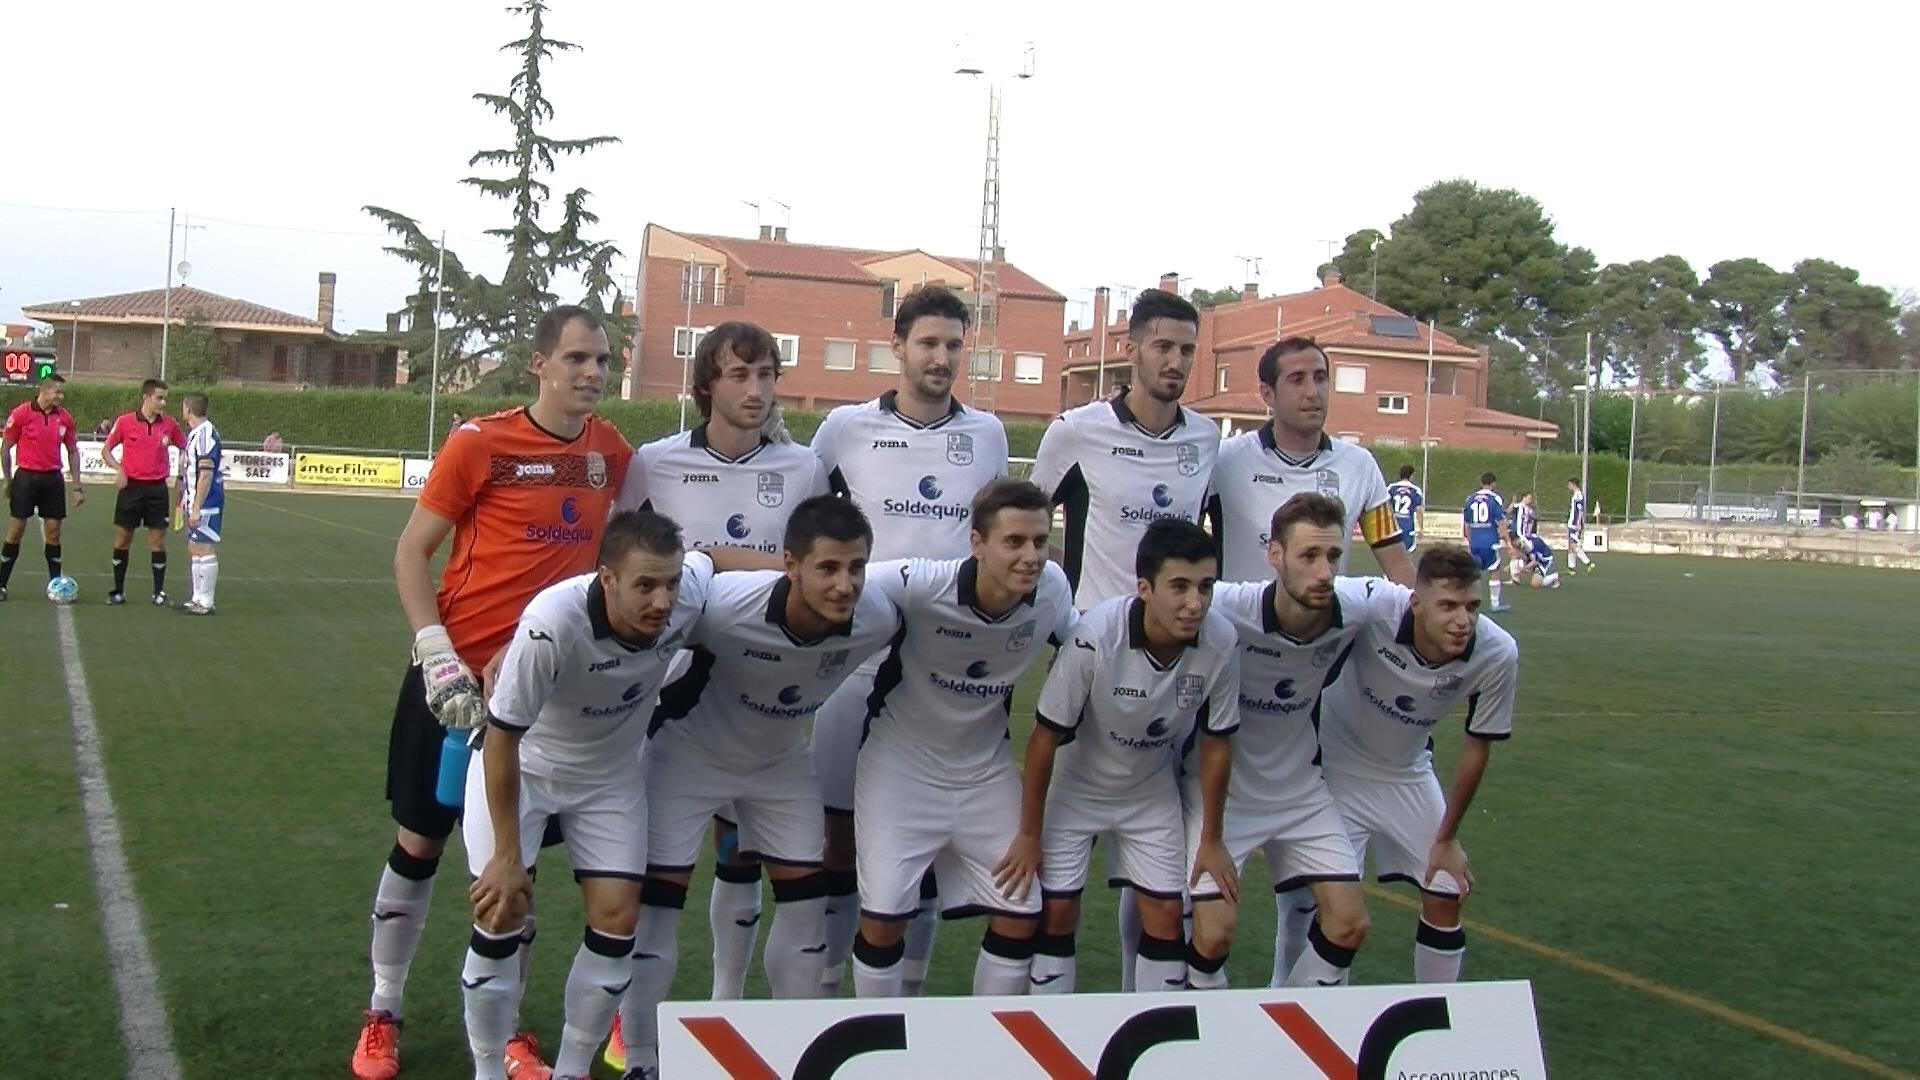 Fútbol Borges.00_00_11_17.Imagen fija001